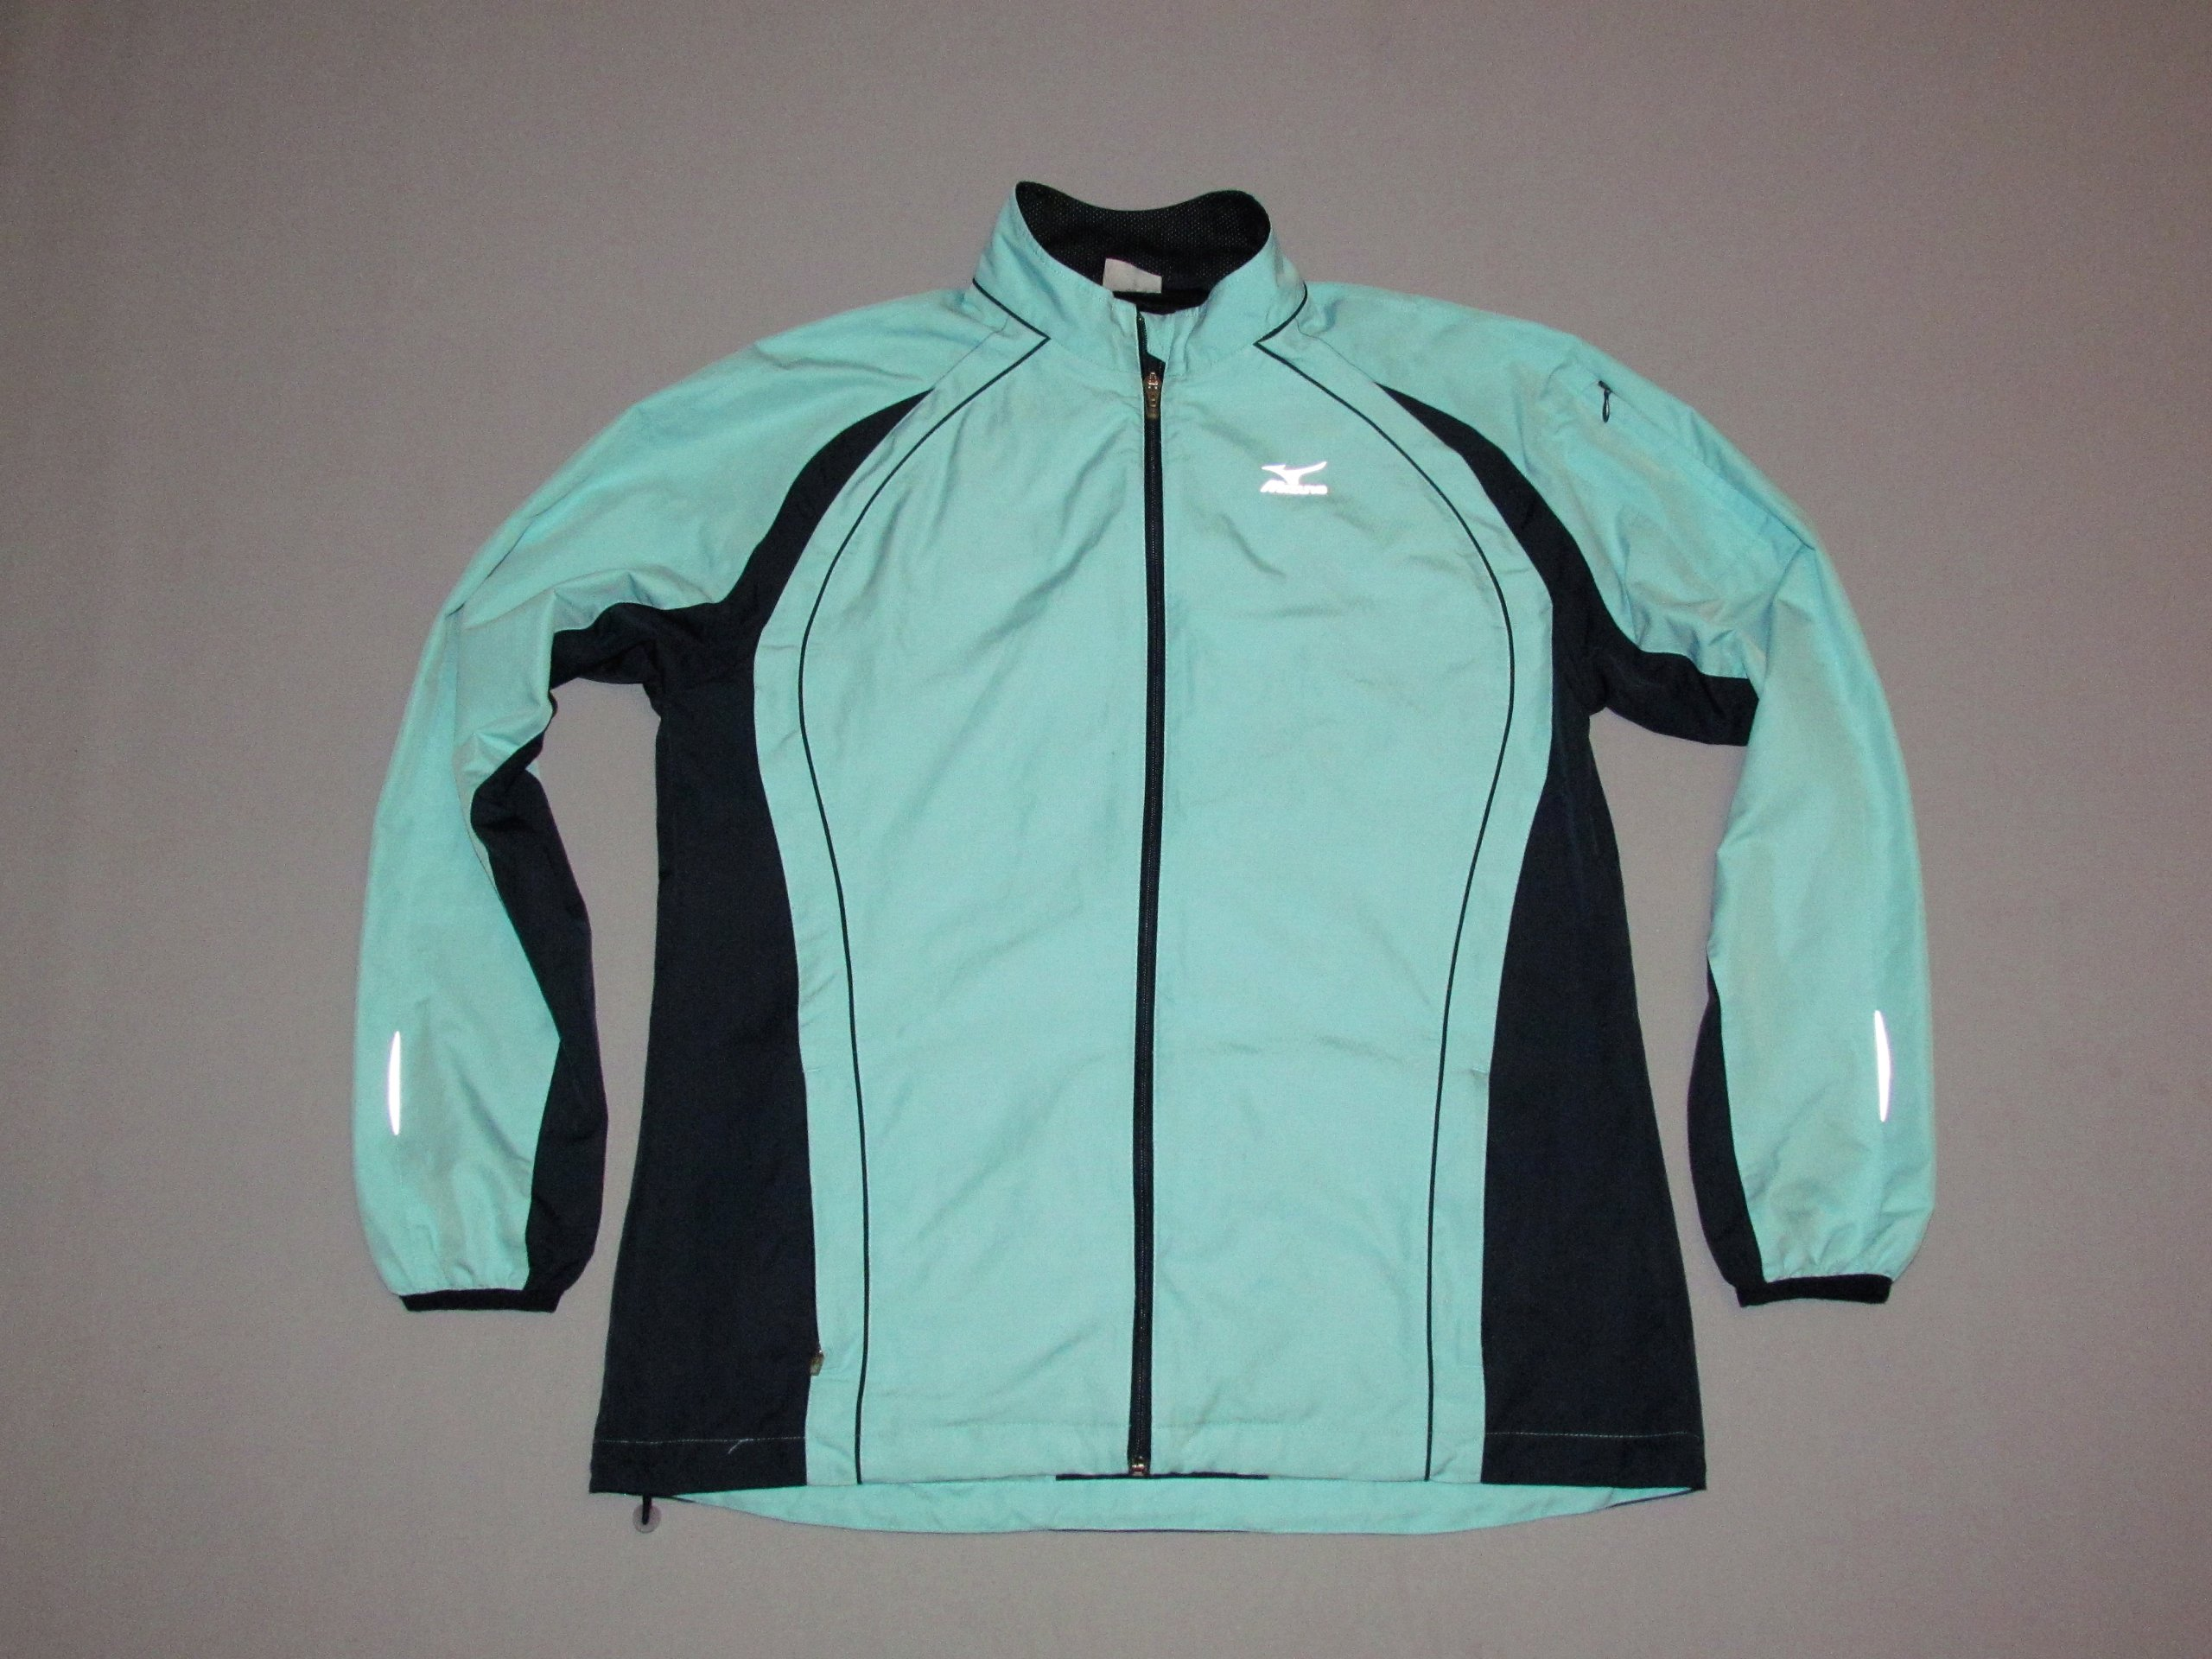 Bluza Mizuno do biegania roz.XL